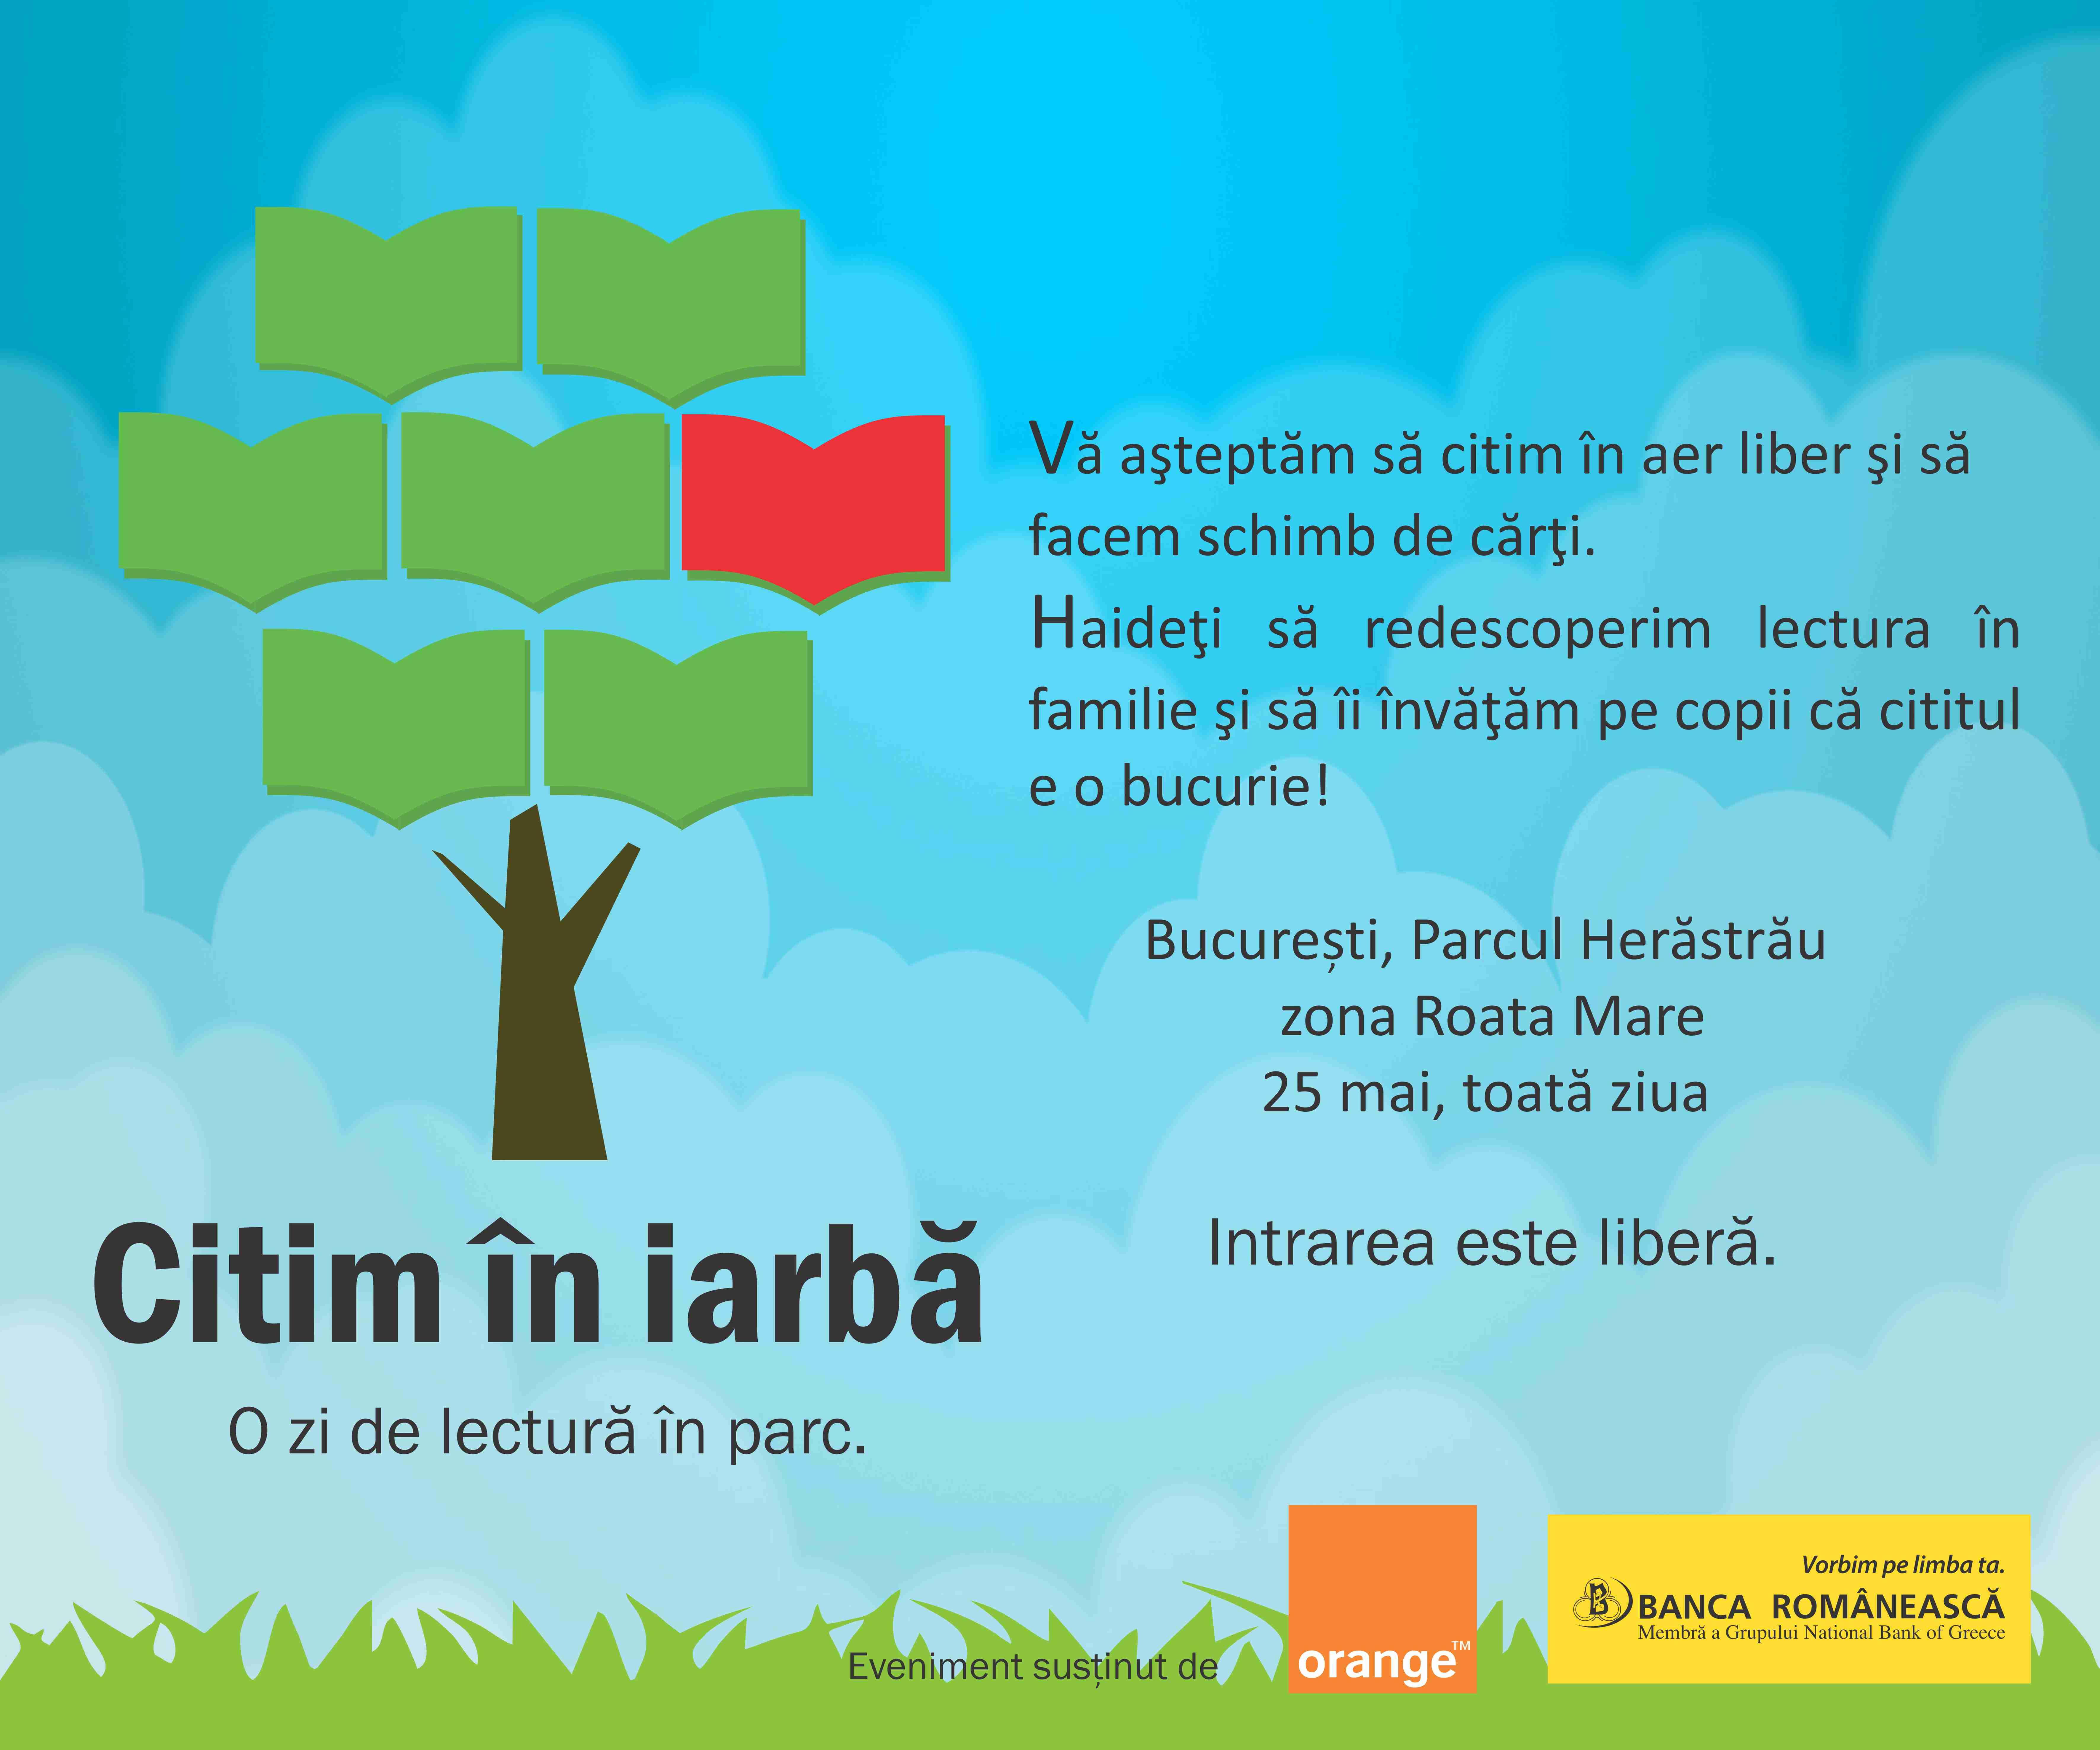 Haideti sa citim in iarba!